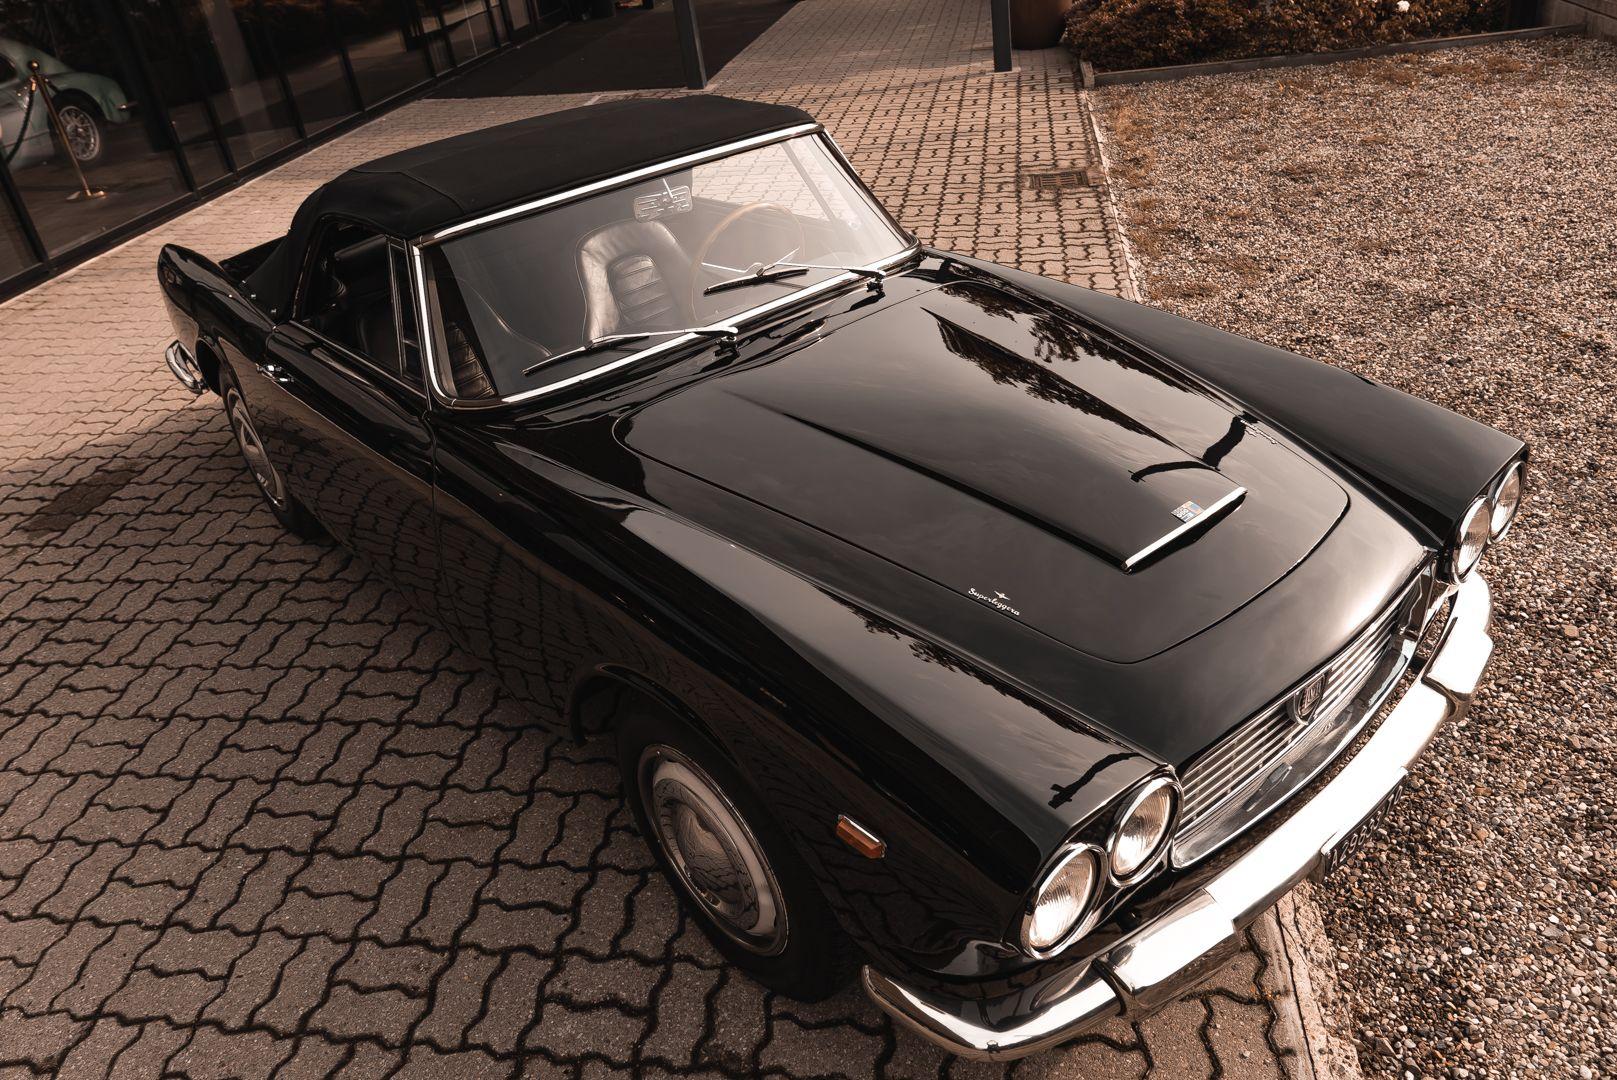 1968 Lancia Flaminia Touring Convertible 2800 3C 79136